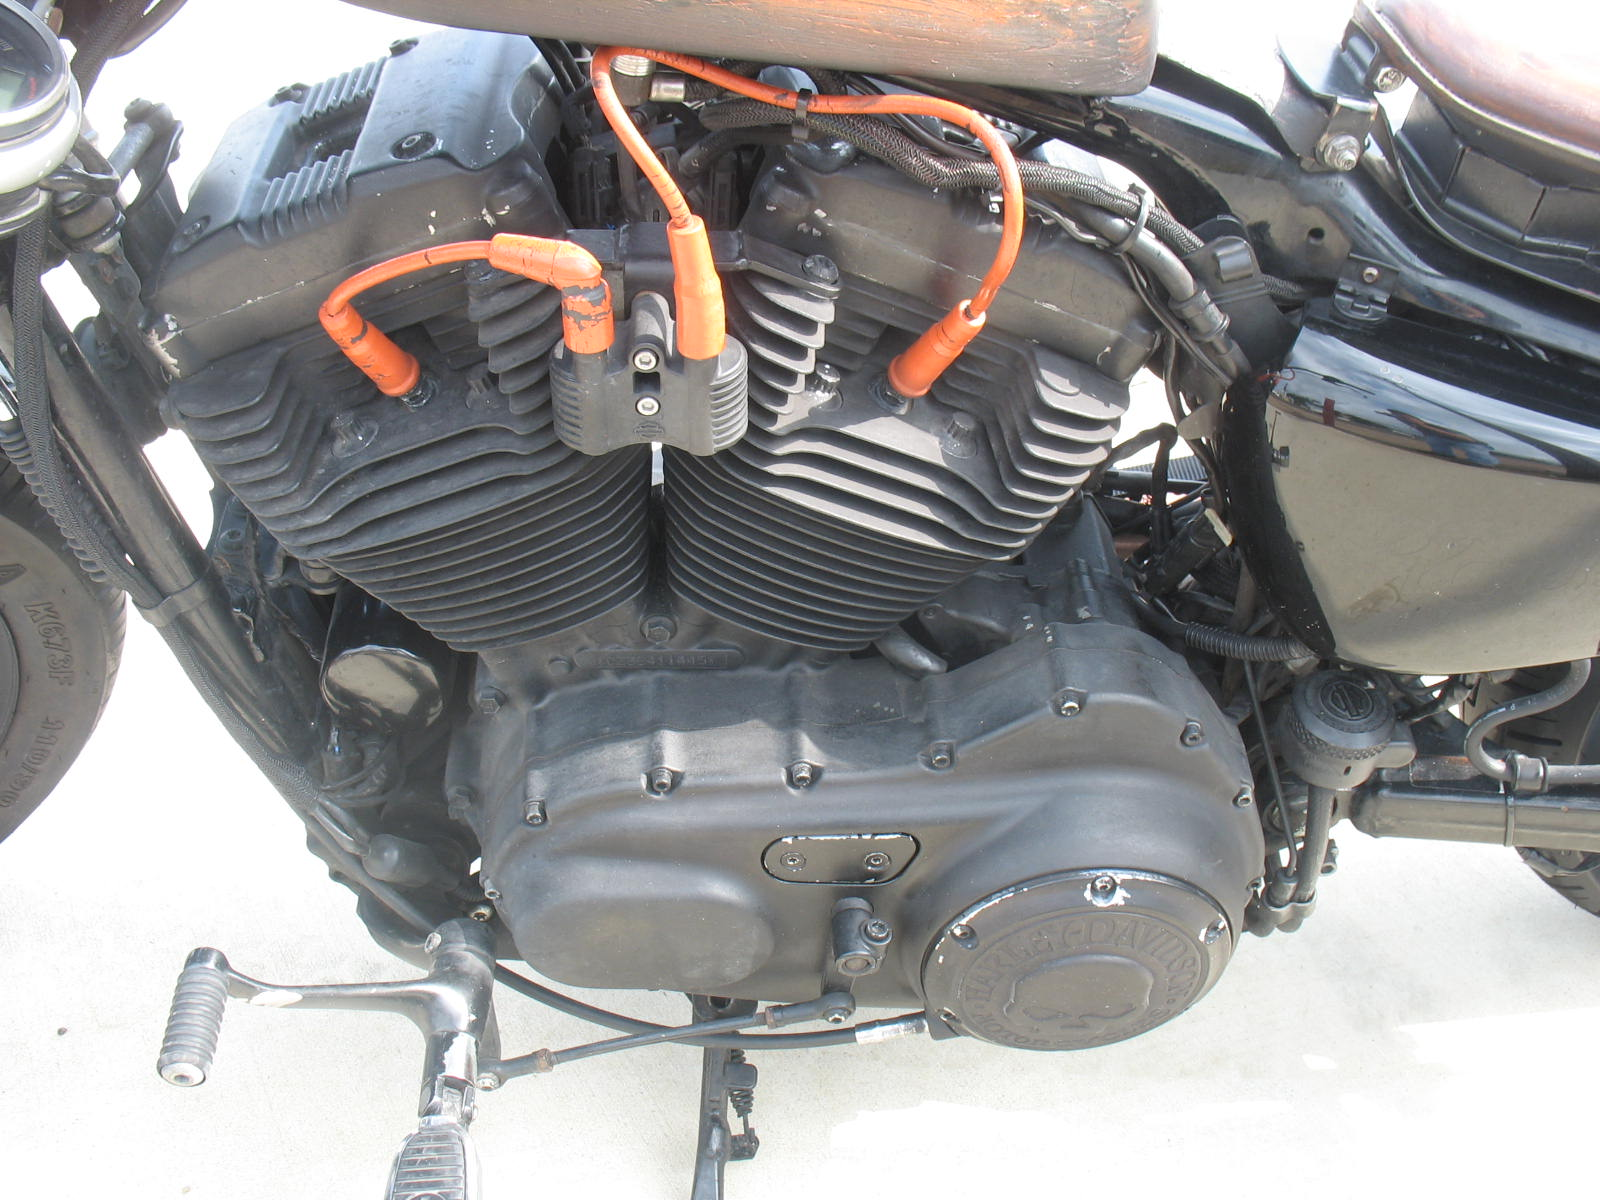 2008 Harley-Davidson® Sportster